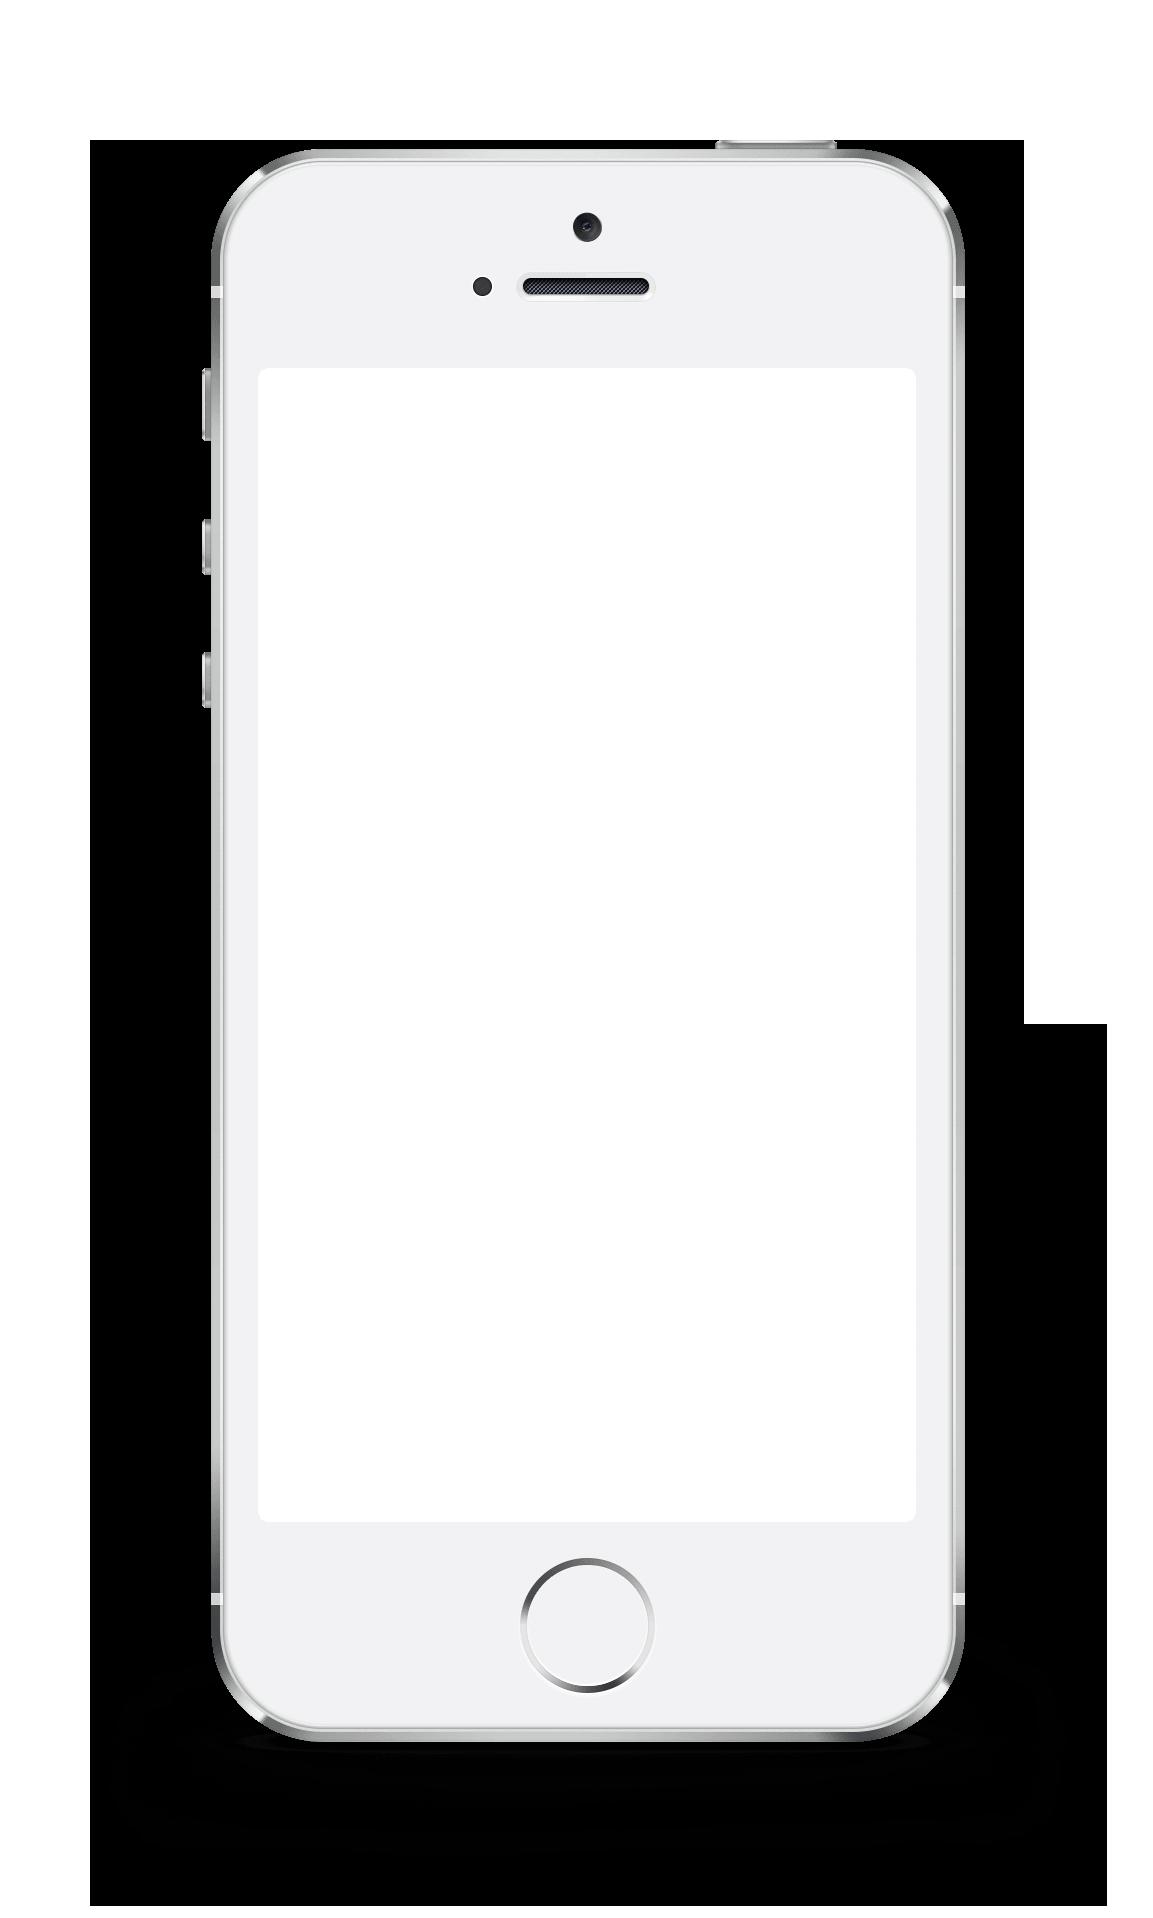 Promo Iphone Free